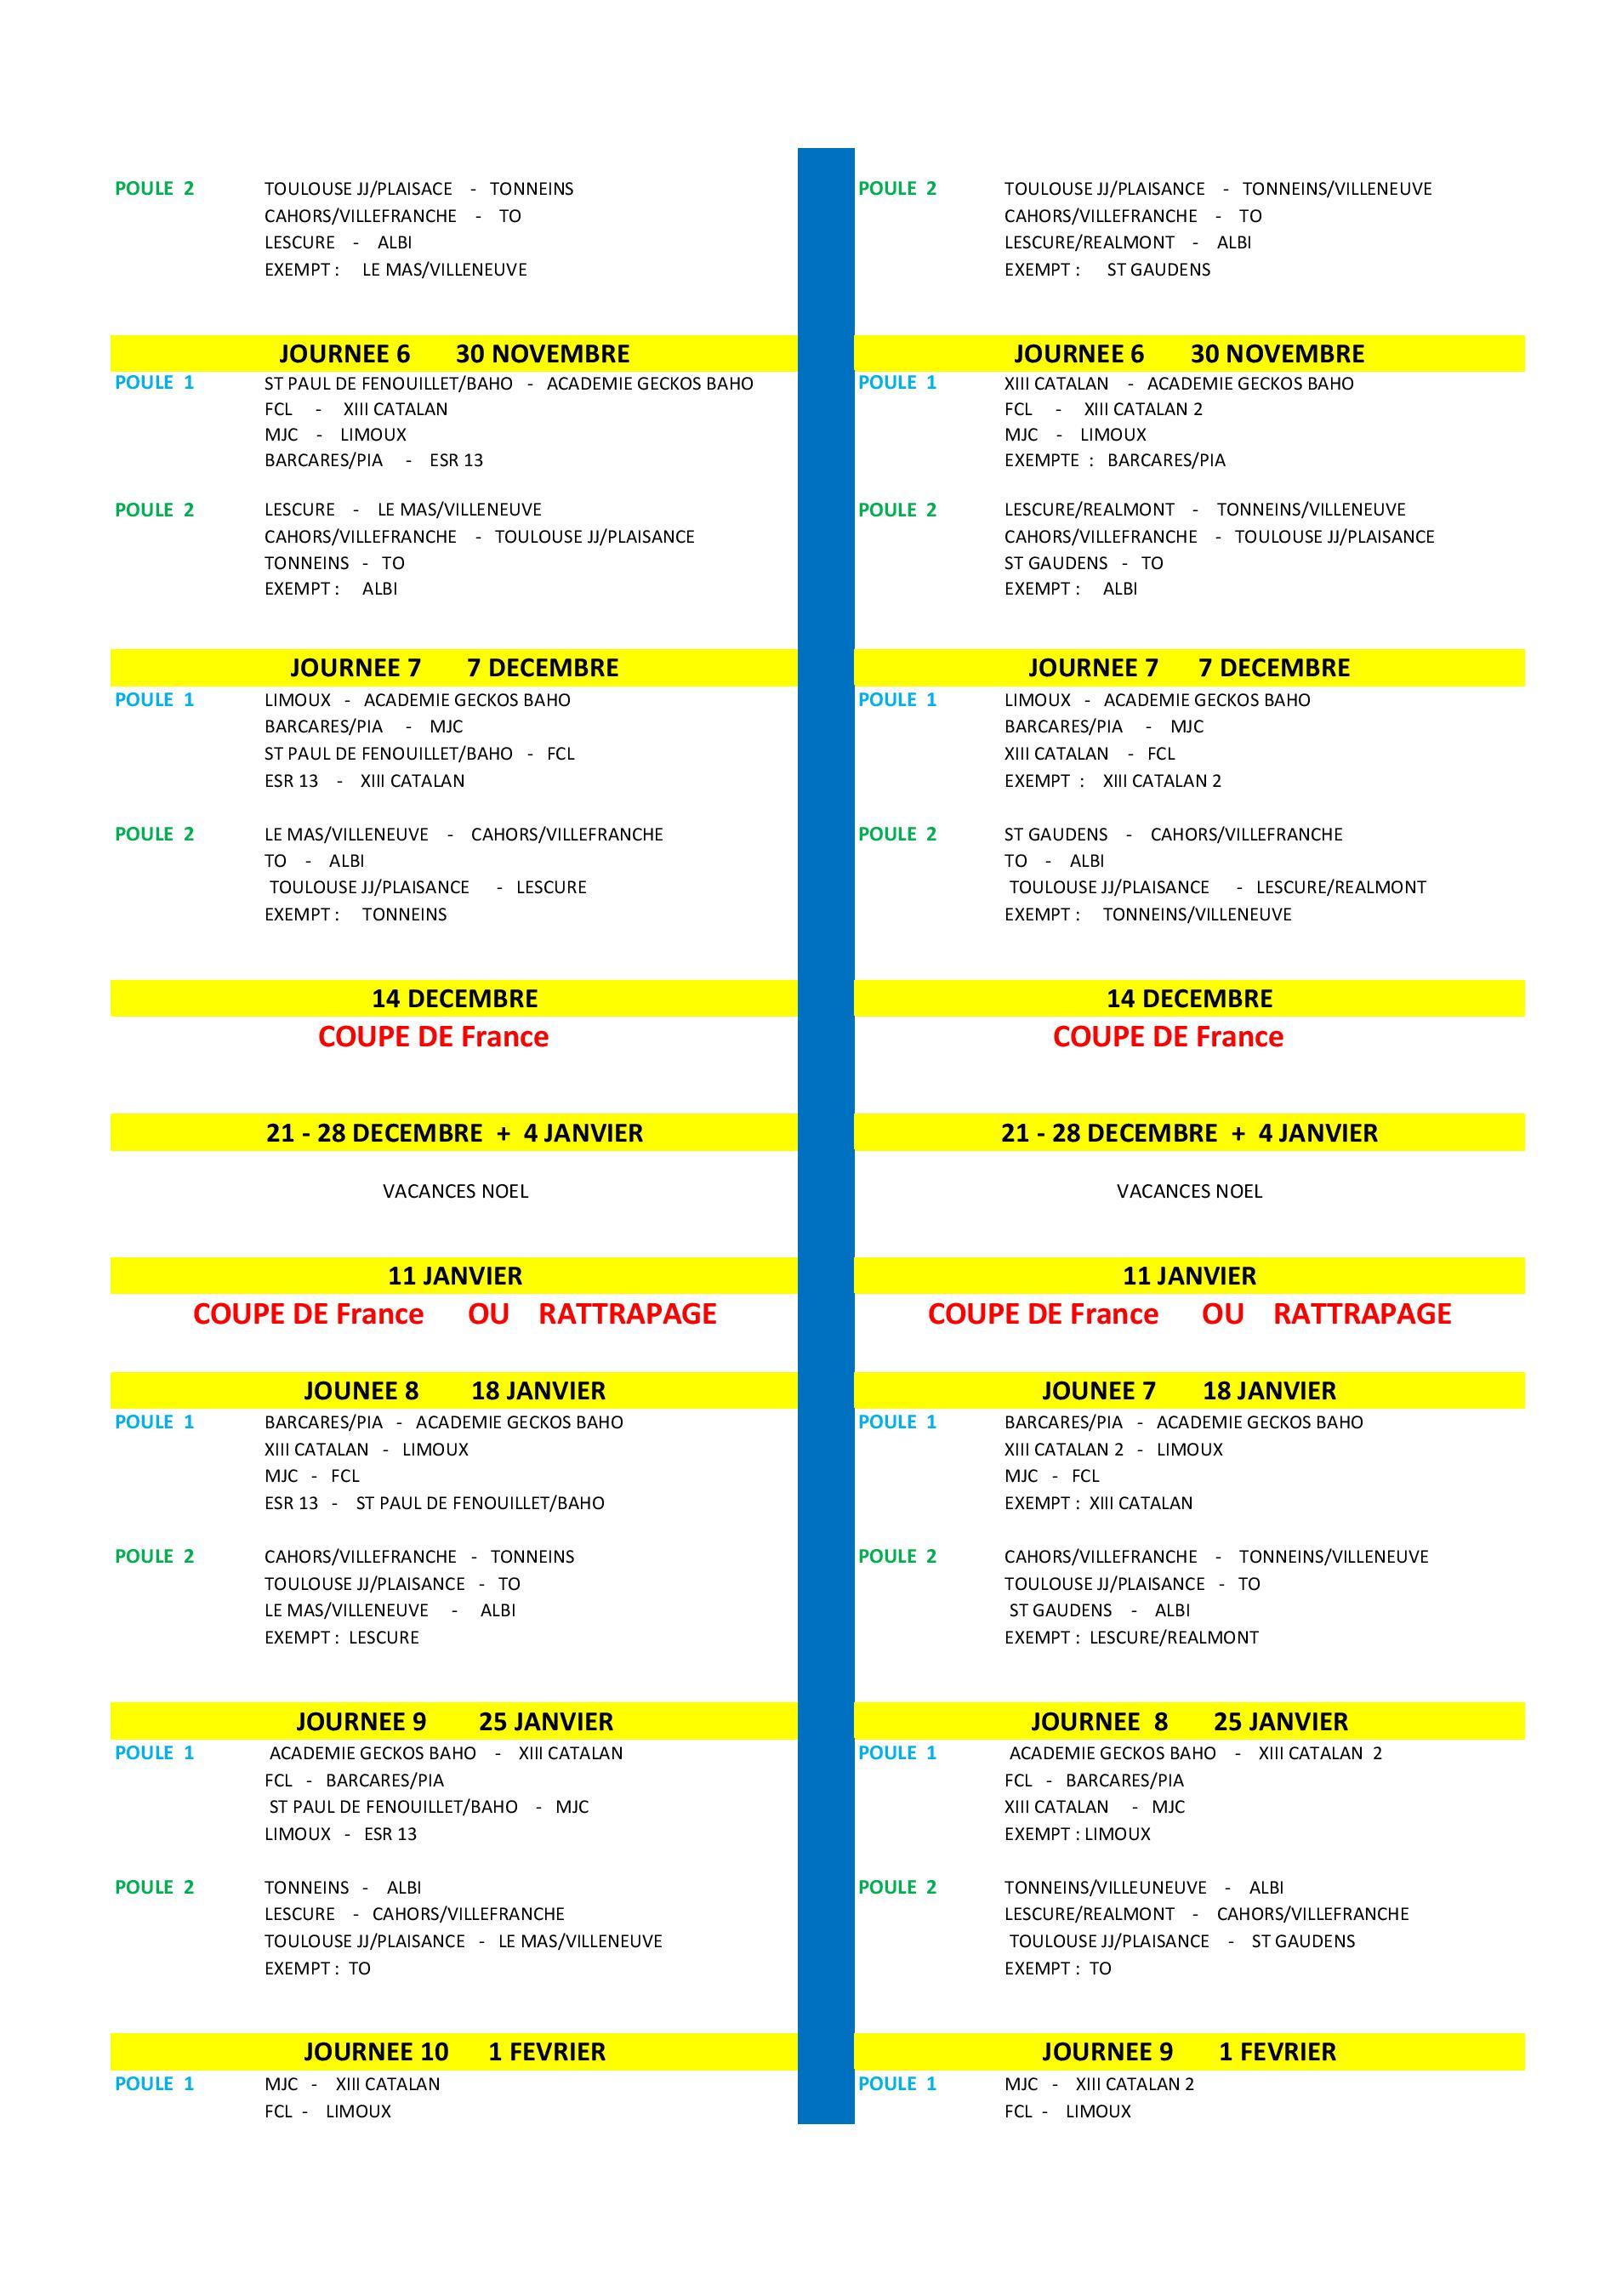 Calendrier Federale 2 2020 2019.Calendriers